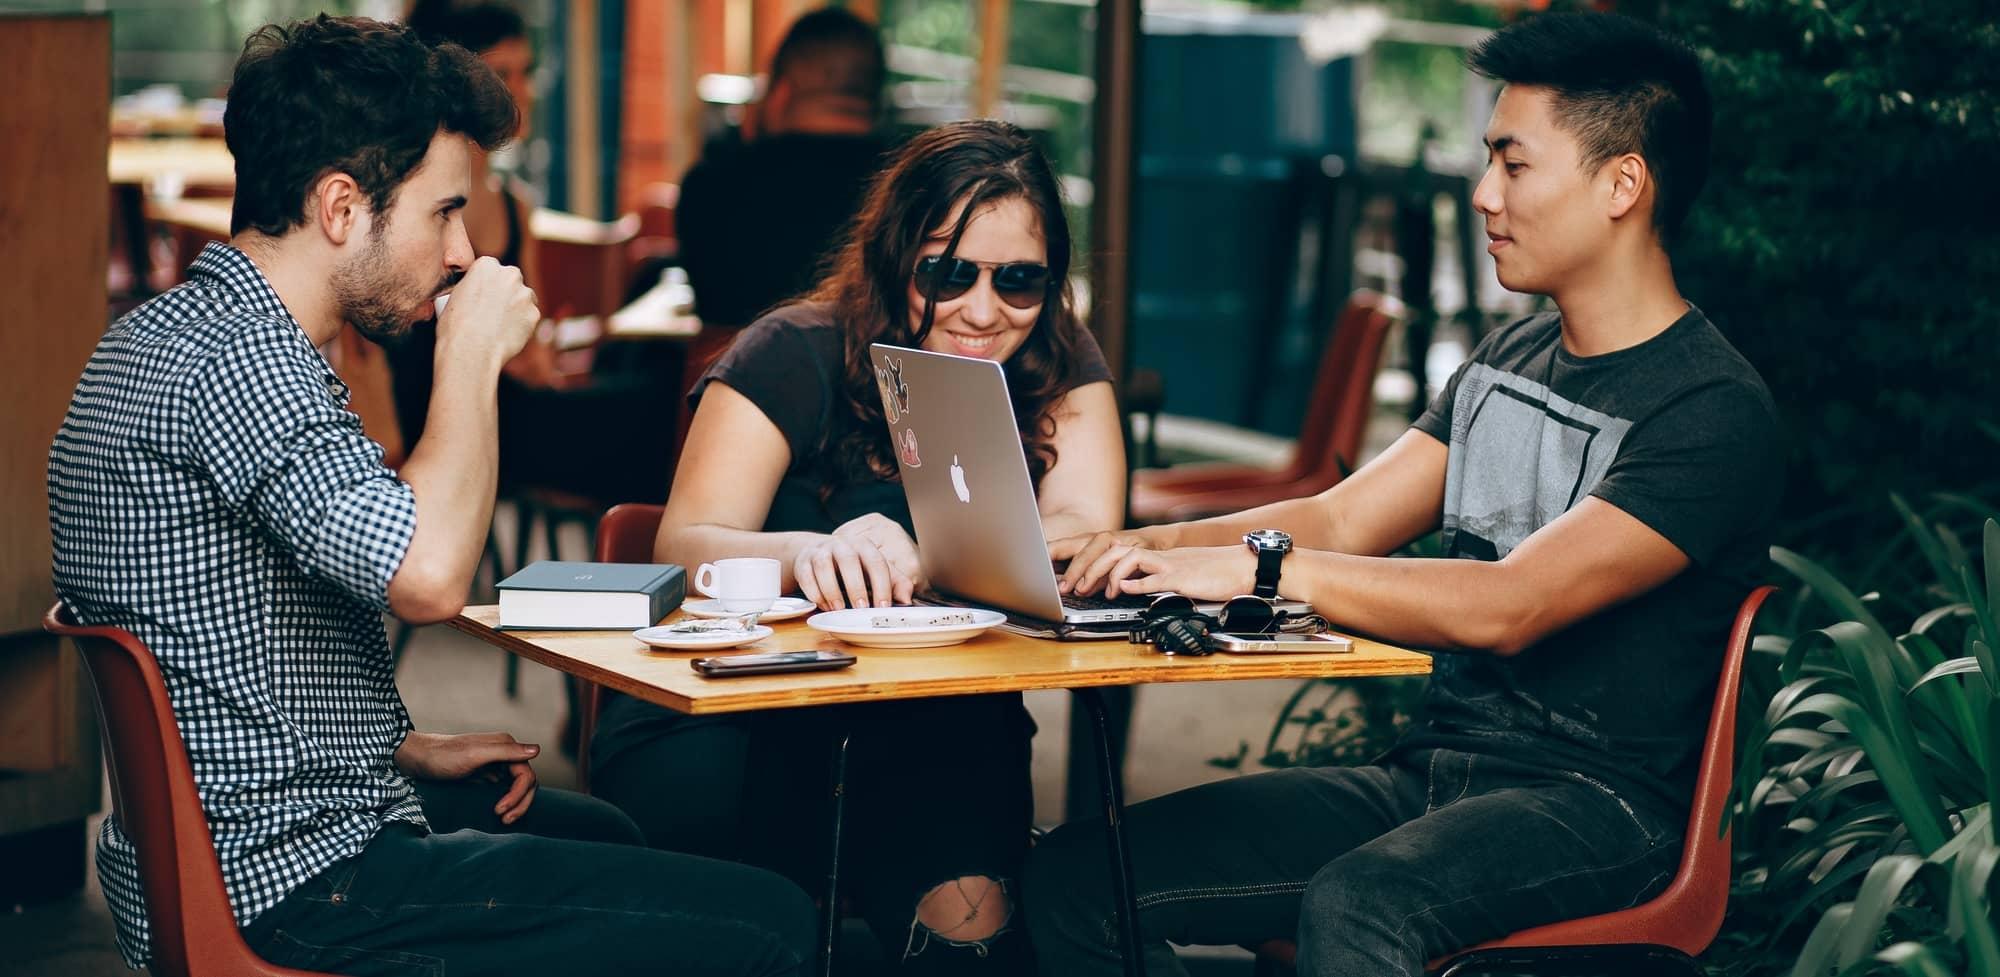 Networking Benefits